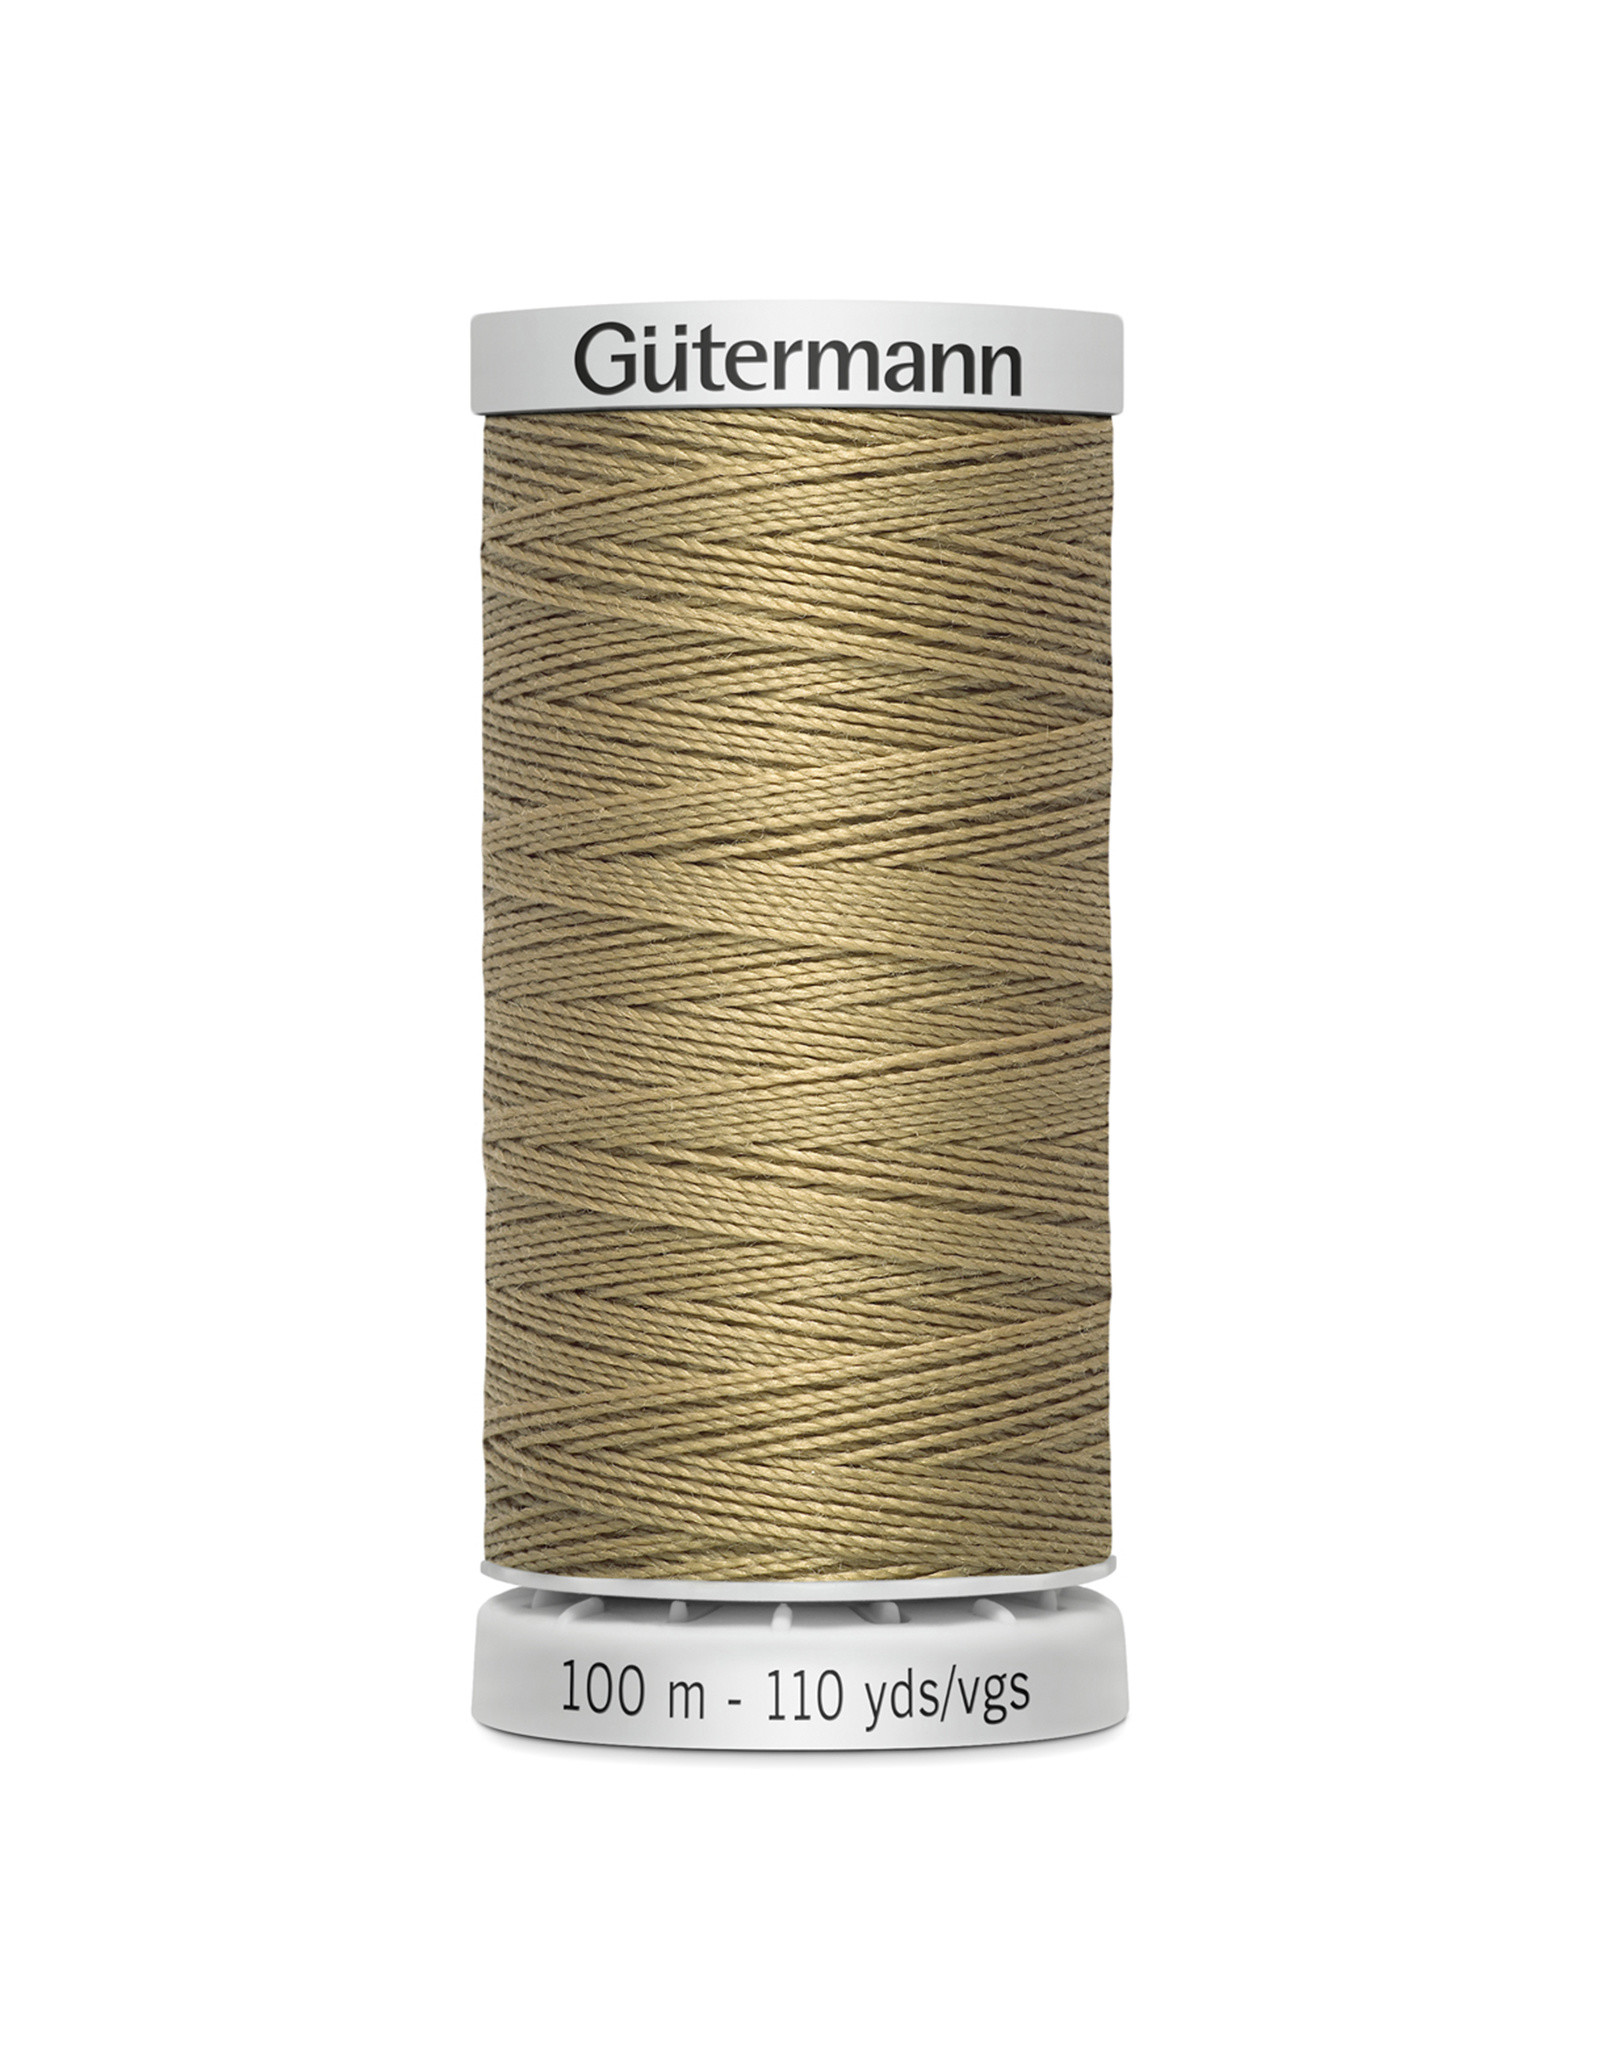 Gütermann Gütermann Super Strong thread 100 m - 265